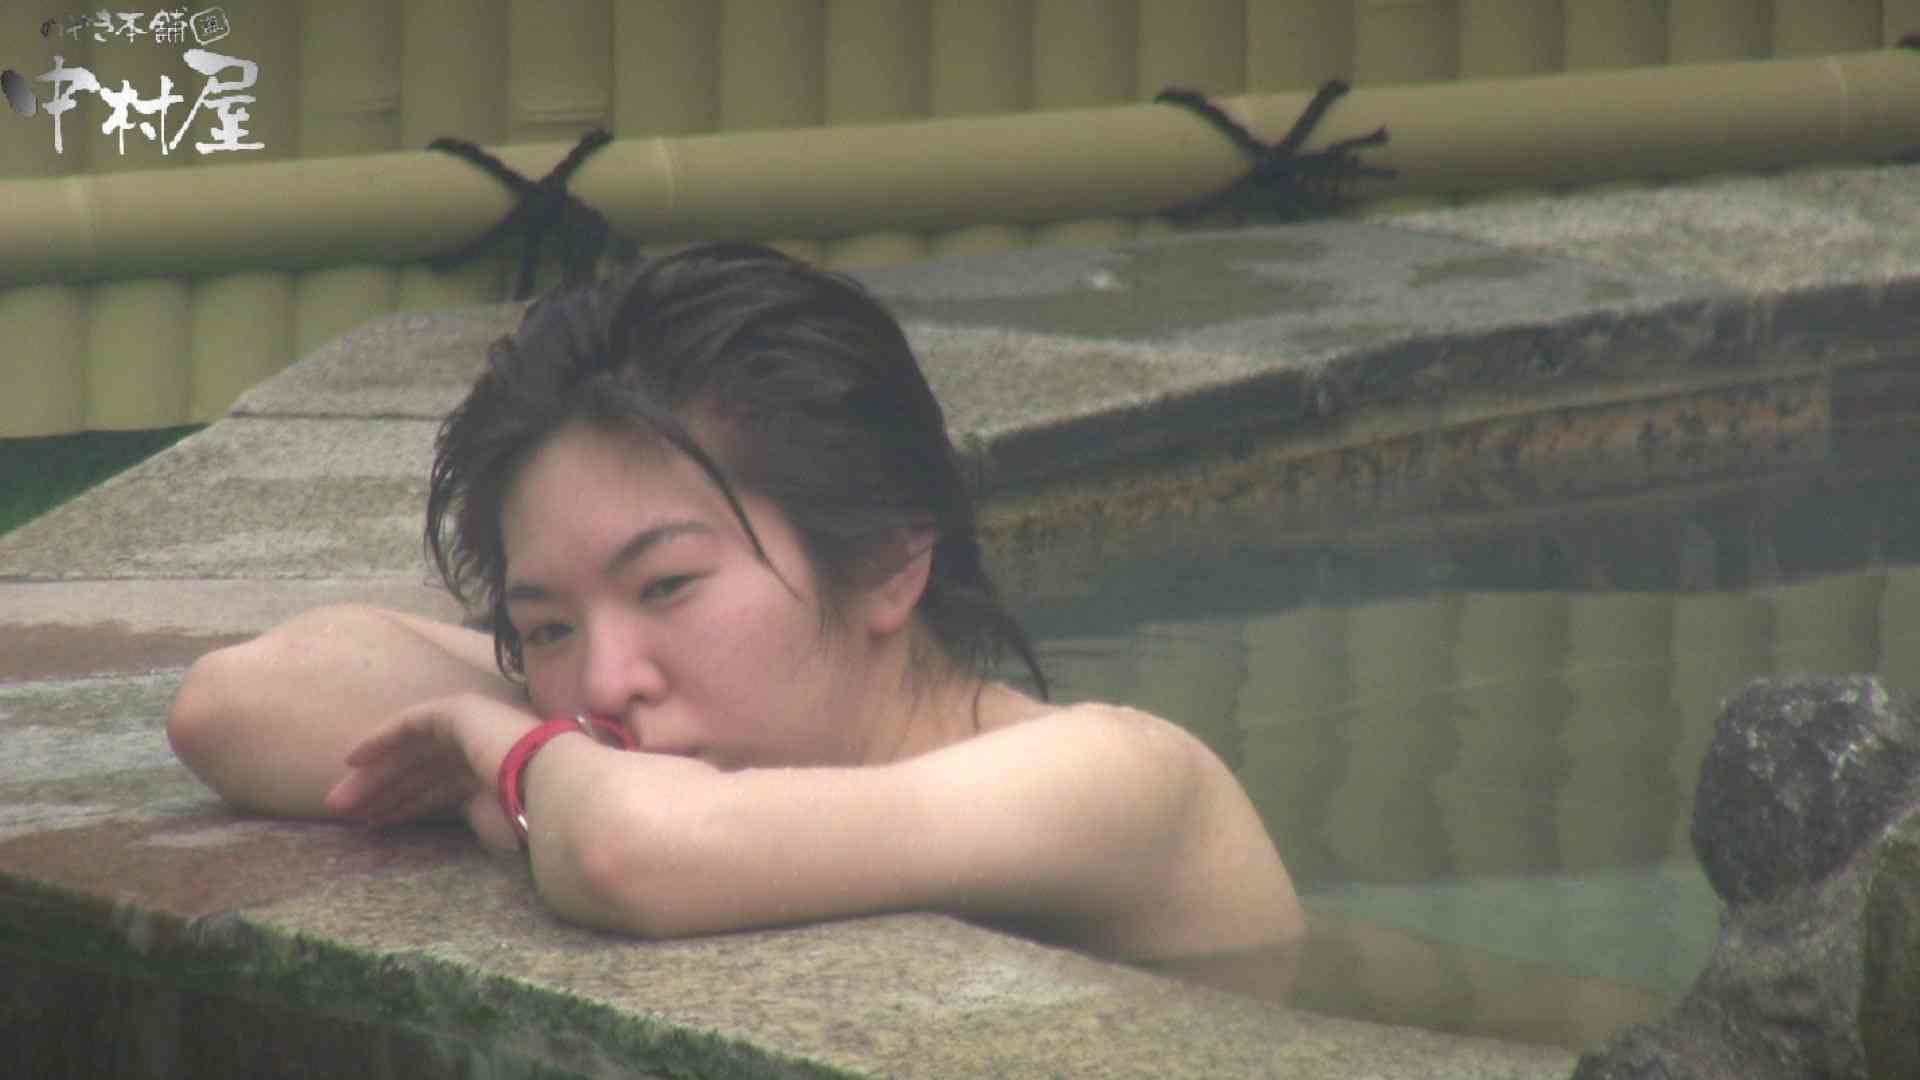 Aquaな露天風呂Vol.907 盗撮師作品   露天風呂突入  70pic 70